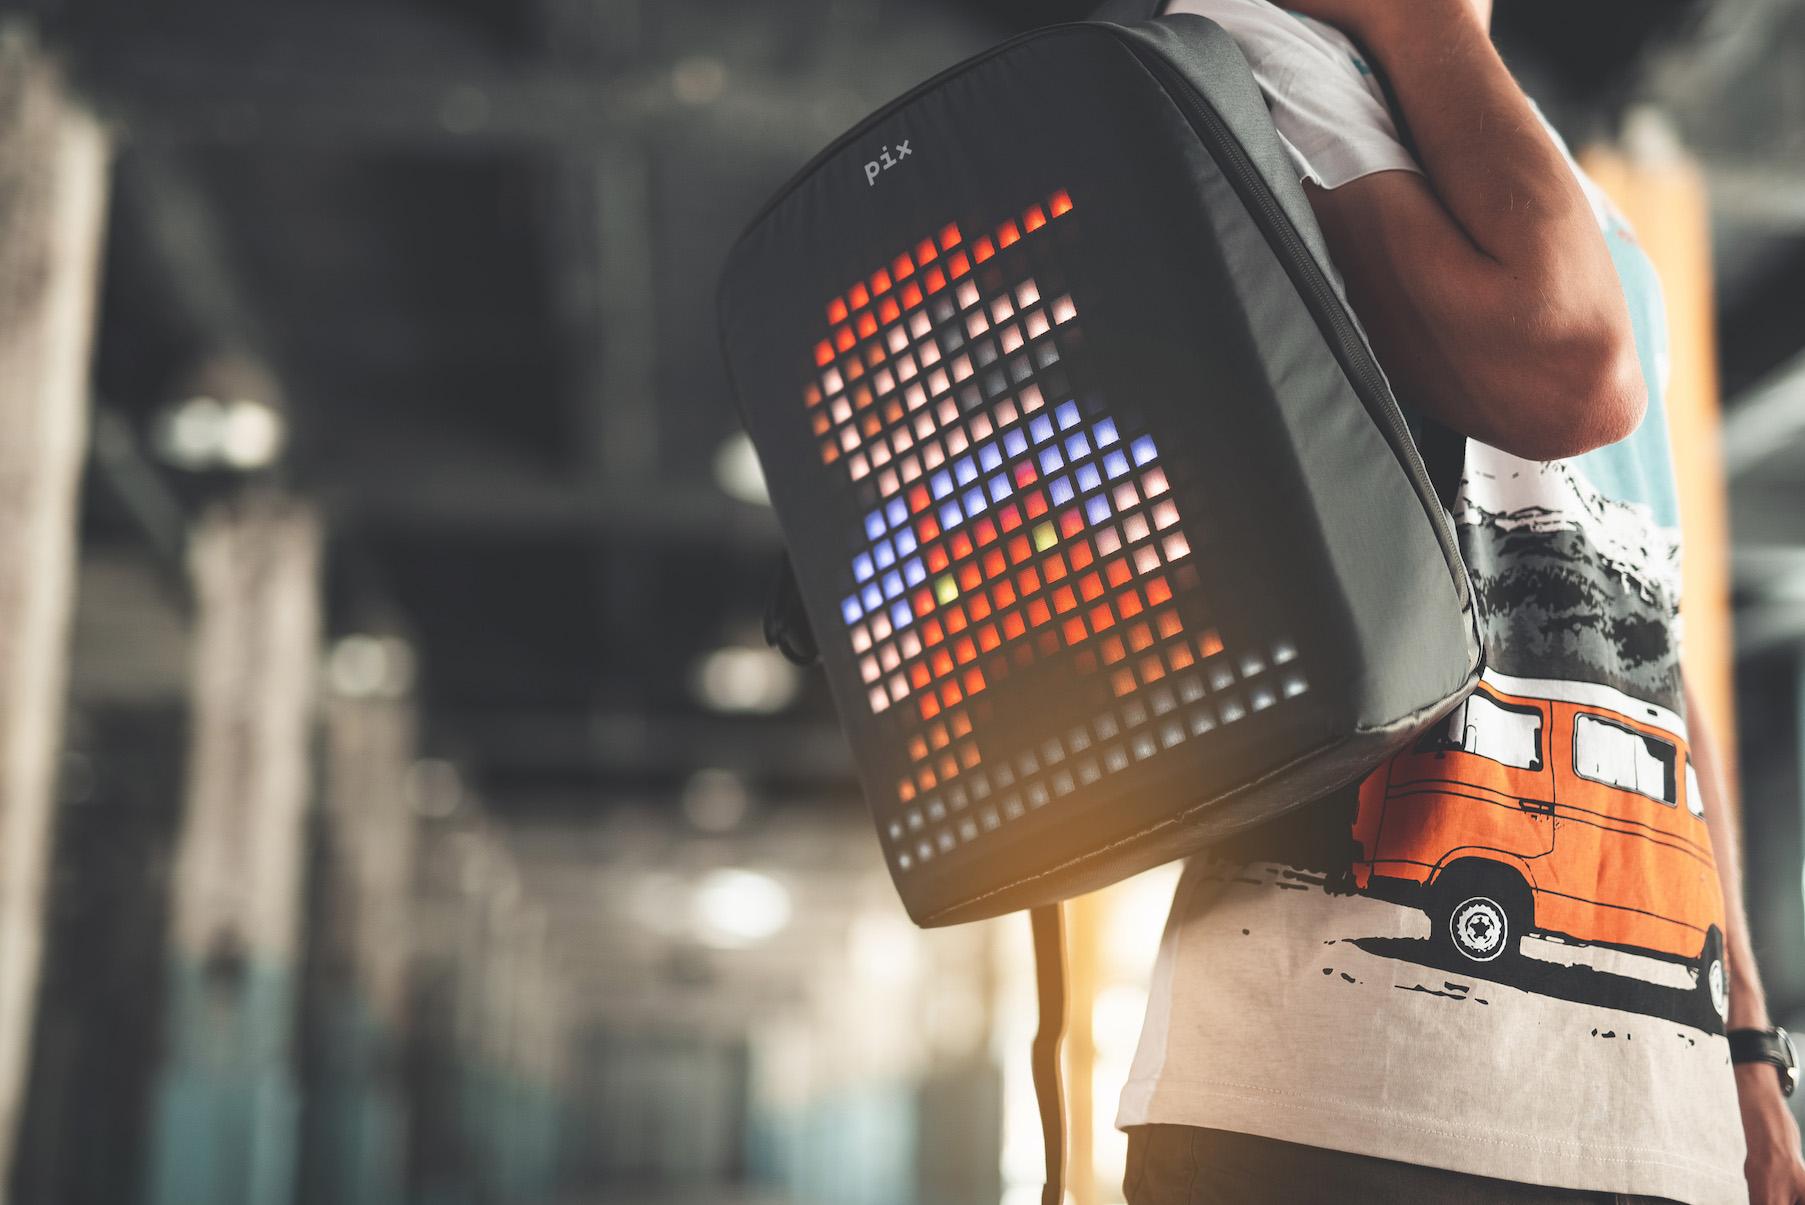 Pix: The Backpack wenn das Rücklicht mal kaputt ist